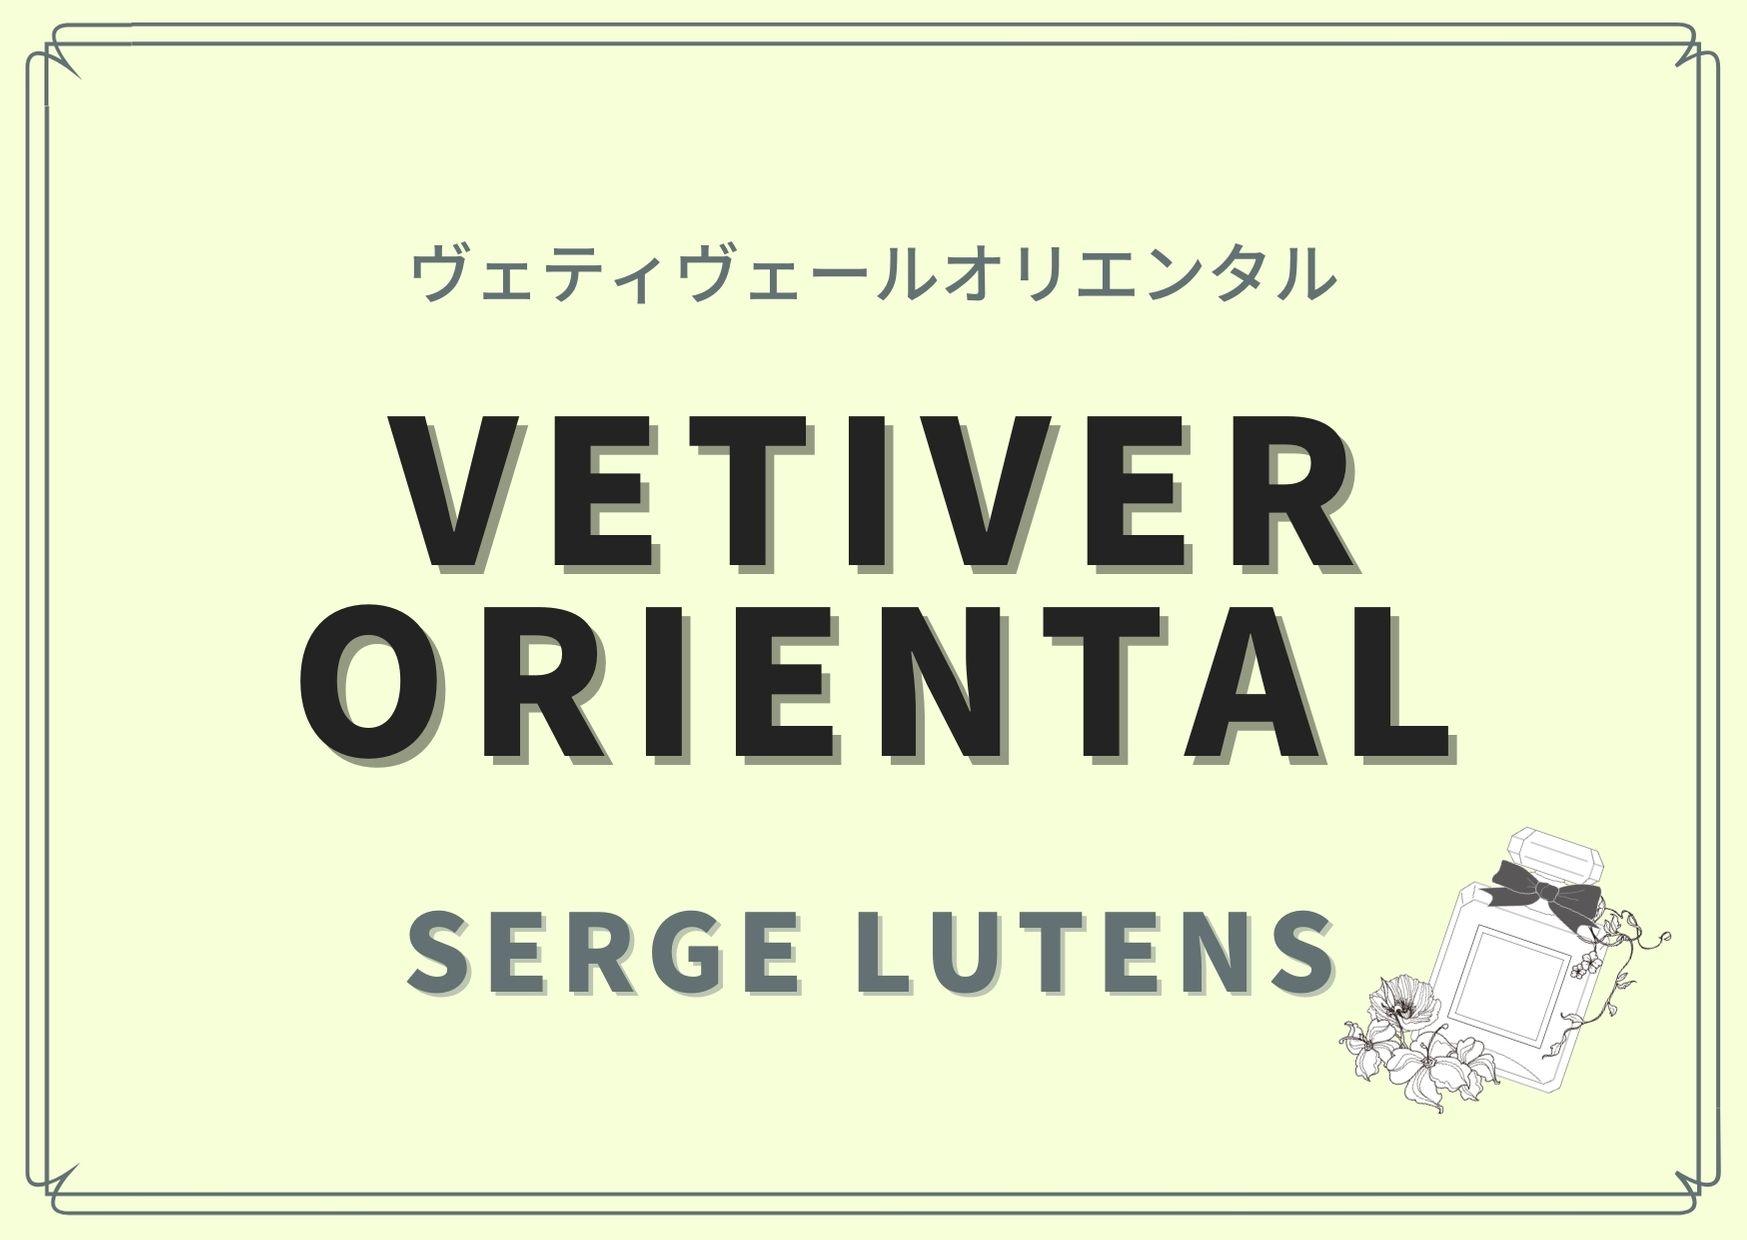 Vetiver Oriental(ヴェティヴェールオリエンタル)/SERGE LUTENS(セルジュ ルタンス)